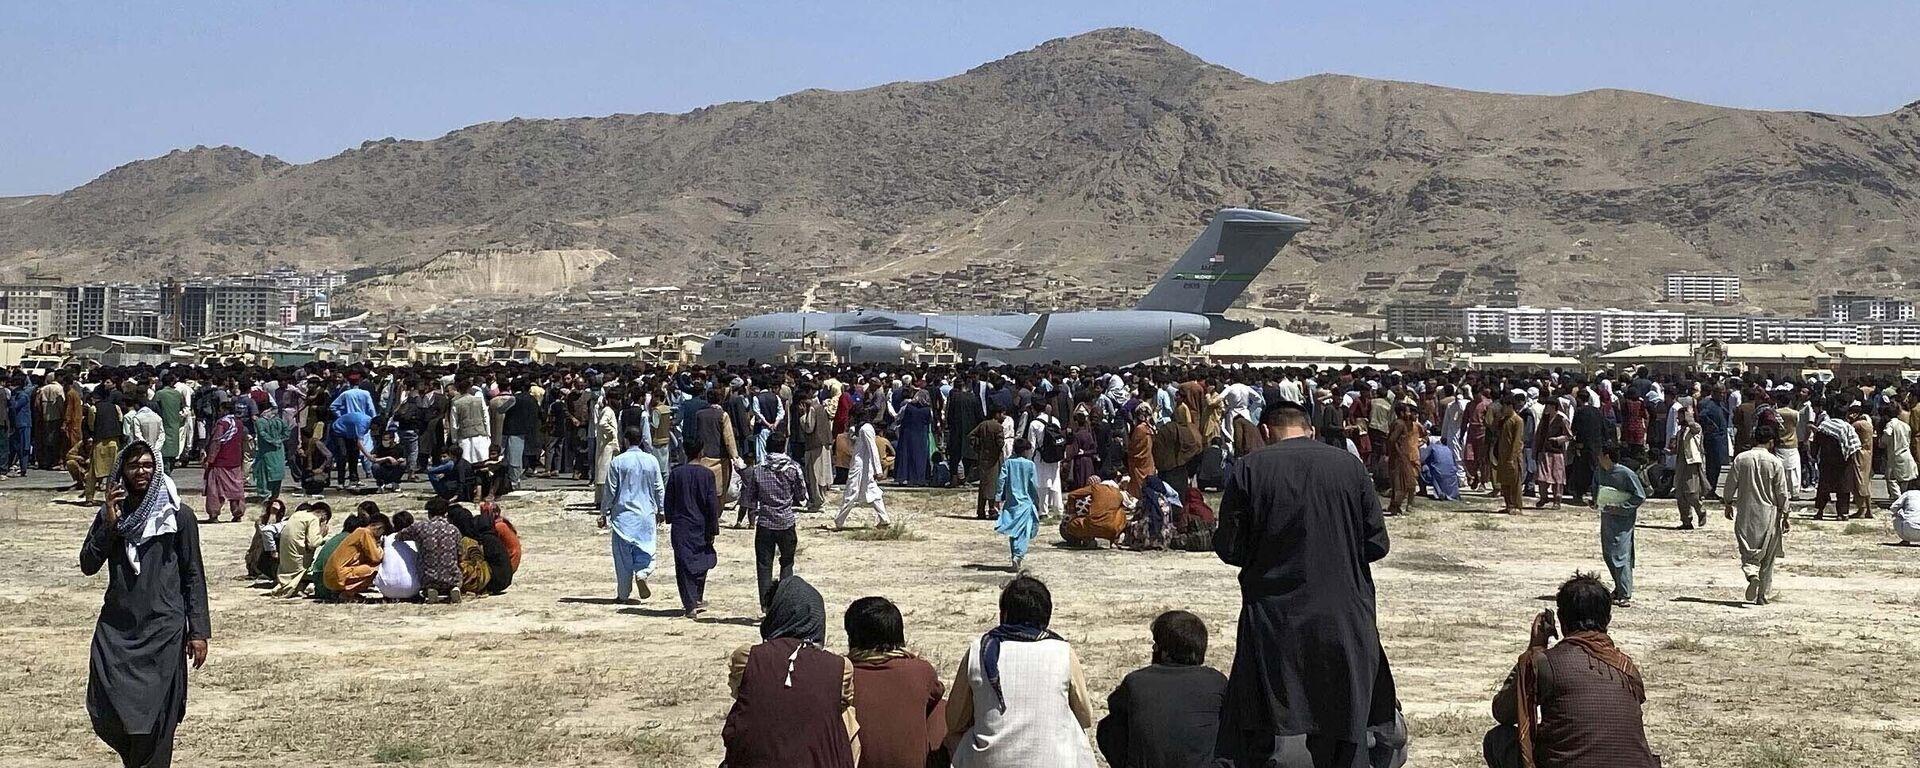 Самолет C-17 в аэропорту Кабула  - Sputnik Таджикистан, 1920, 27.08.2021